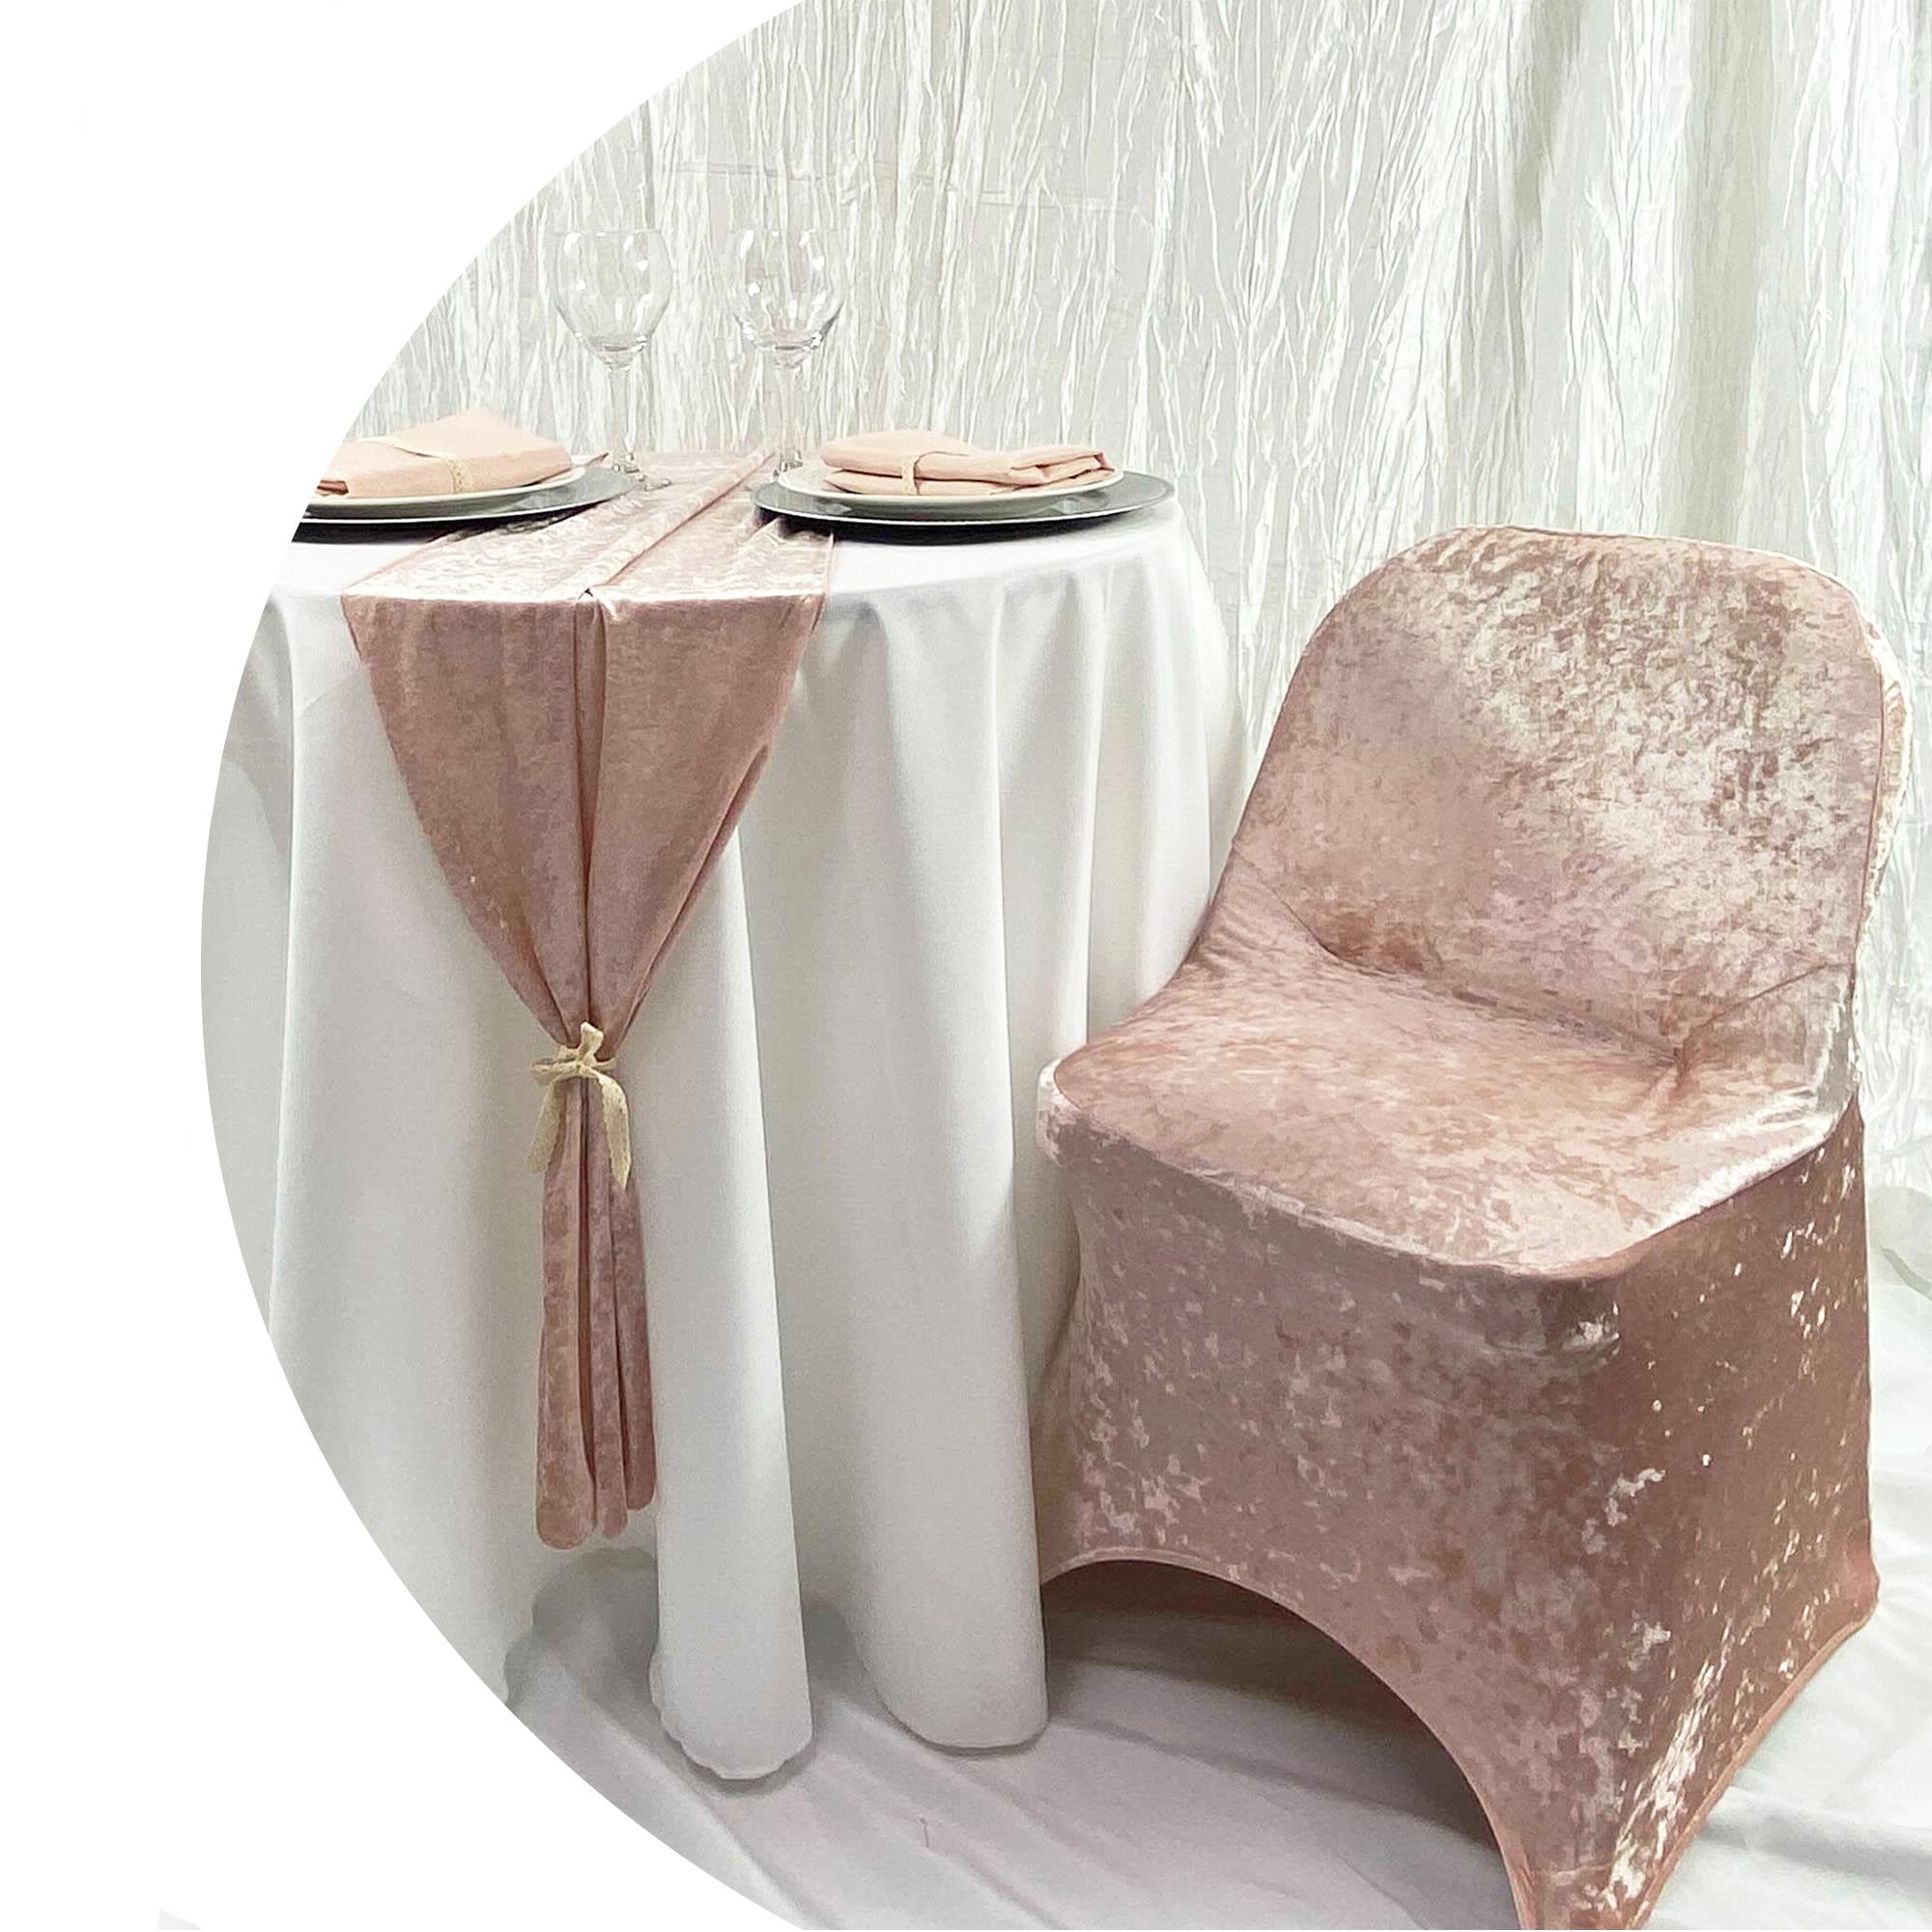 vel-chair-covers-main3.jpg